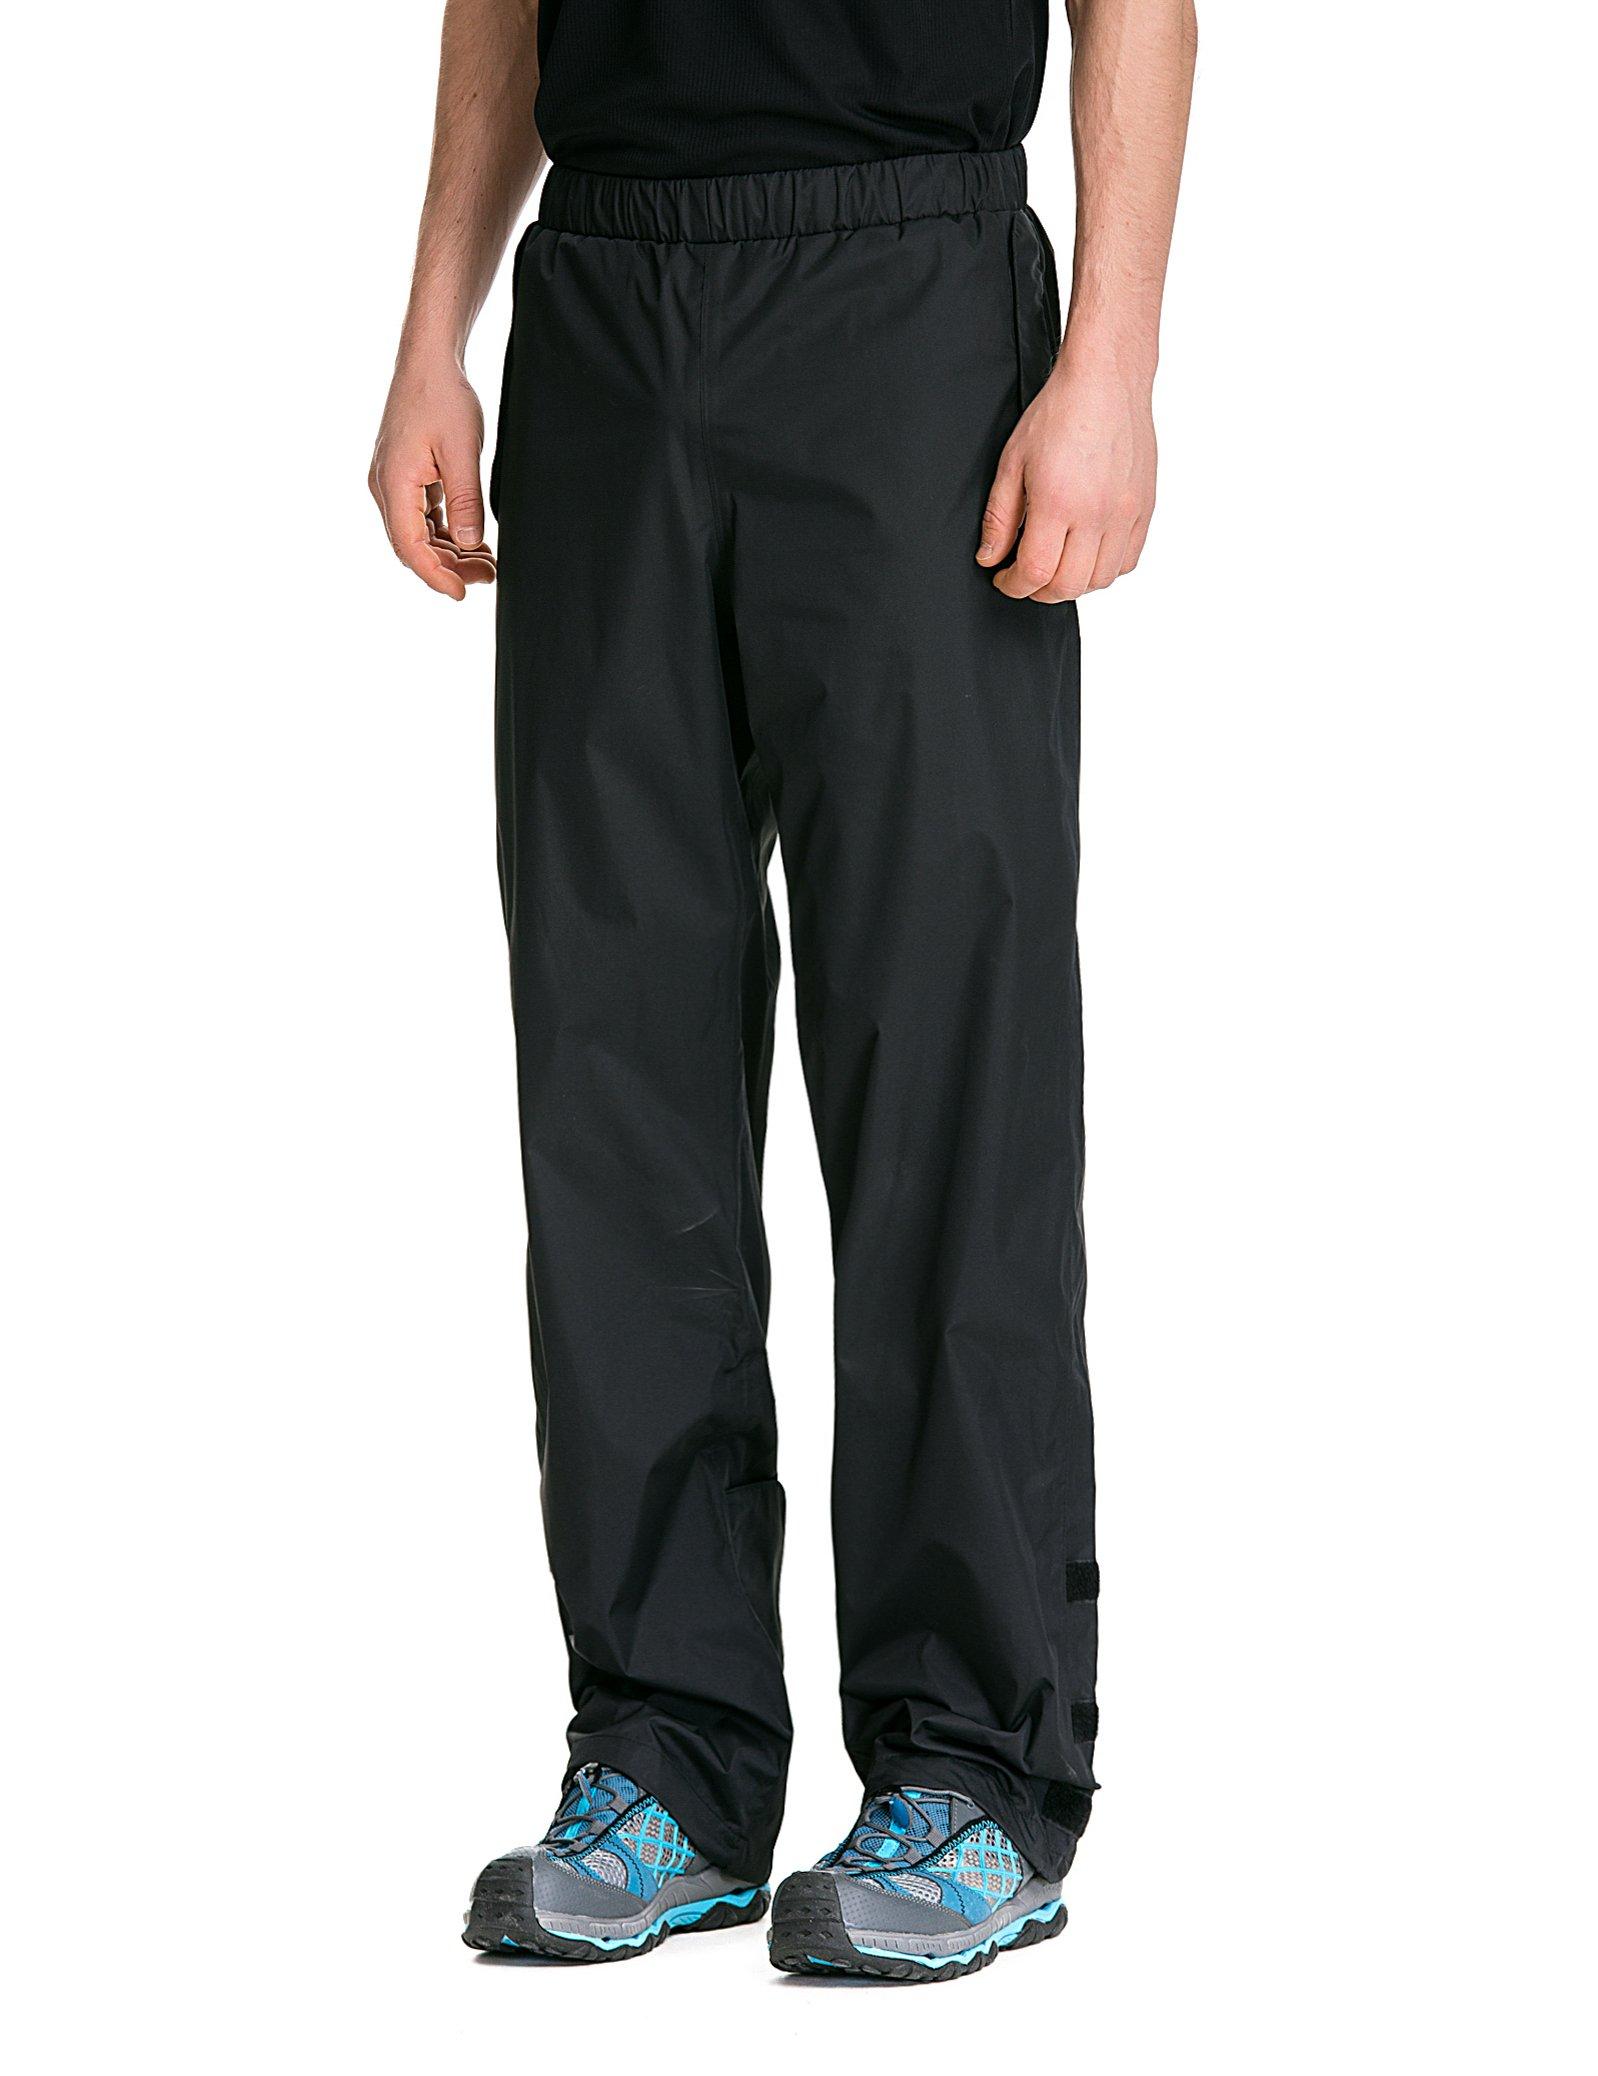 Trailside Supply Co. Men's Waterproof Windproof Elastic-Waist Rain Pants (Black,X-Large) by Trailside Supply Co. (Image #4)